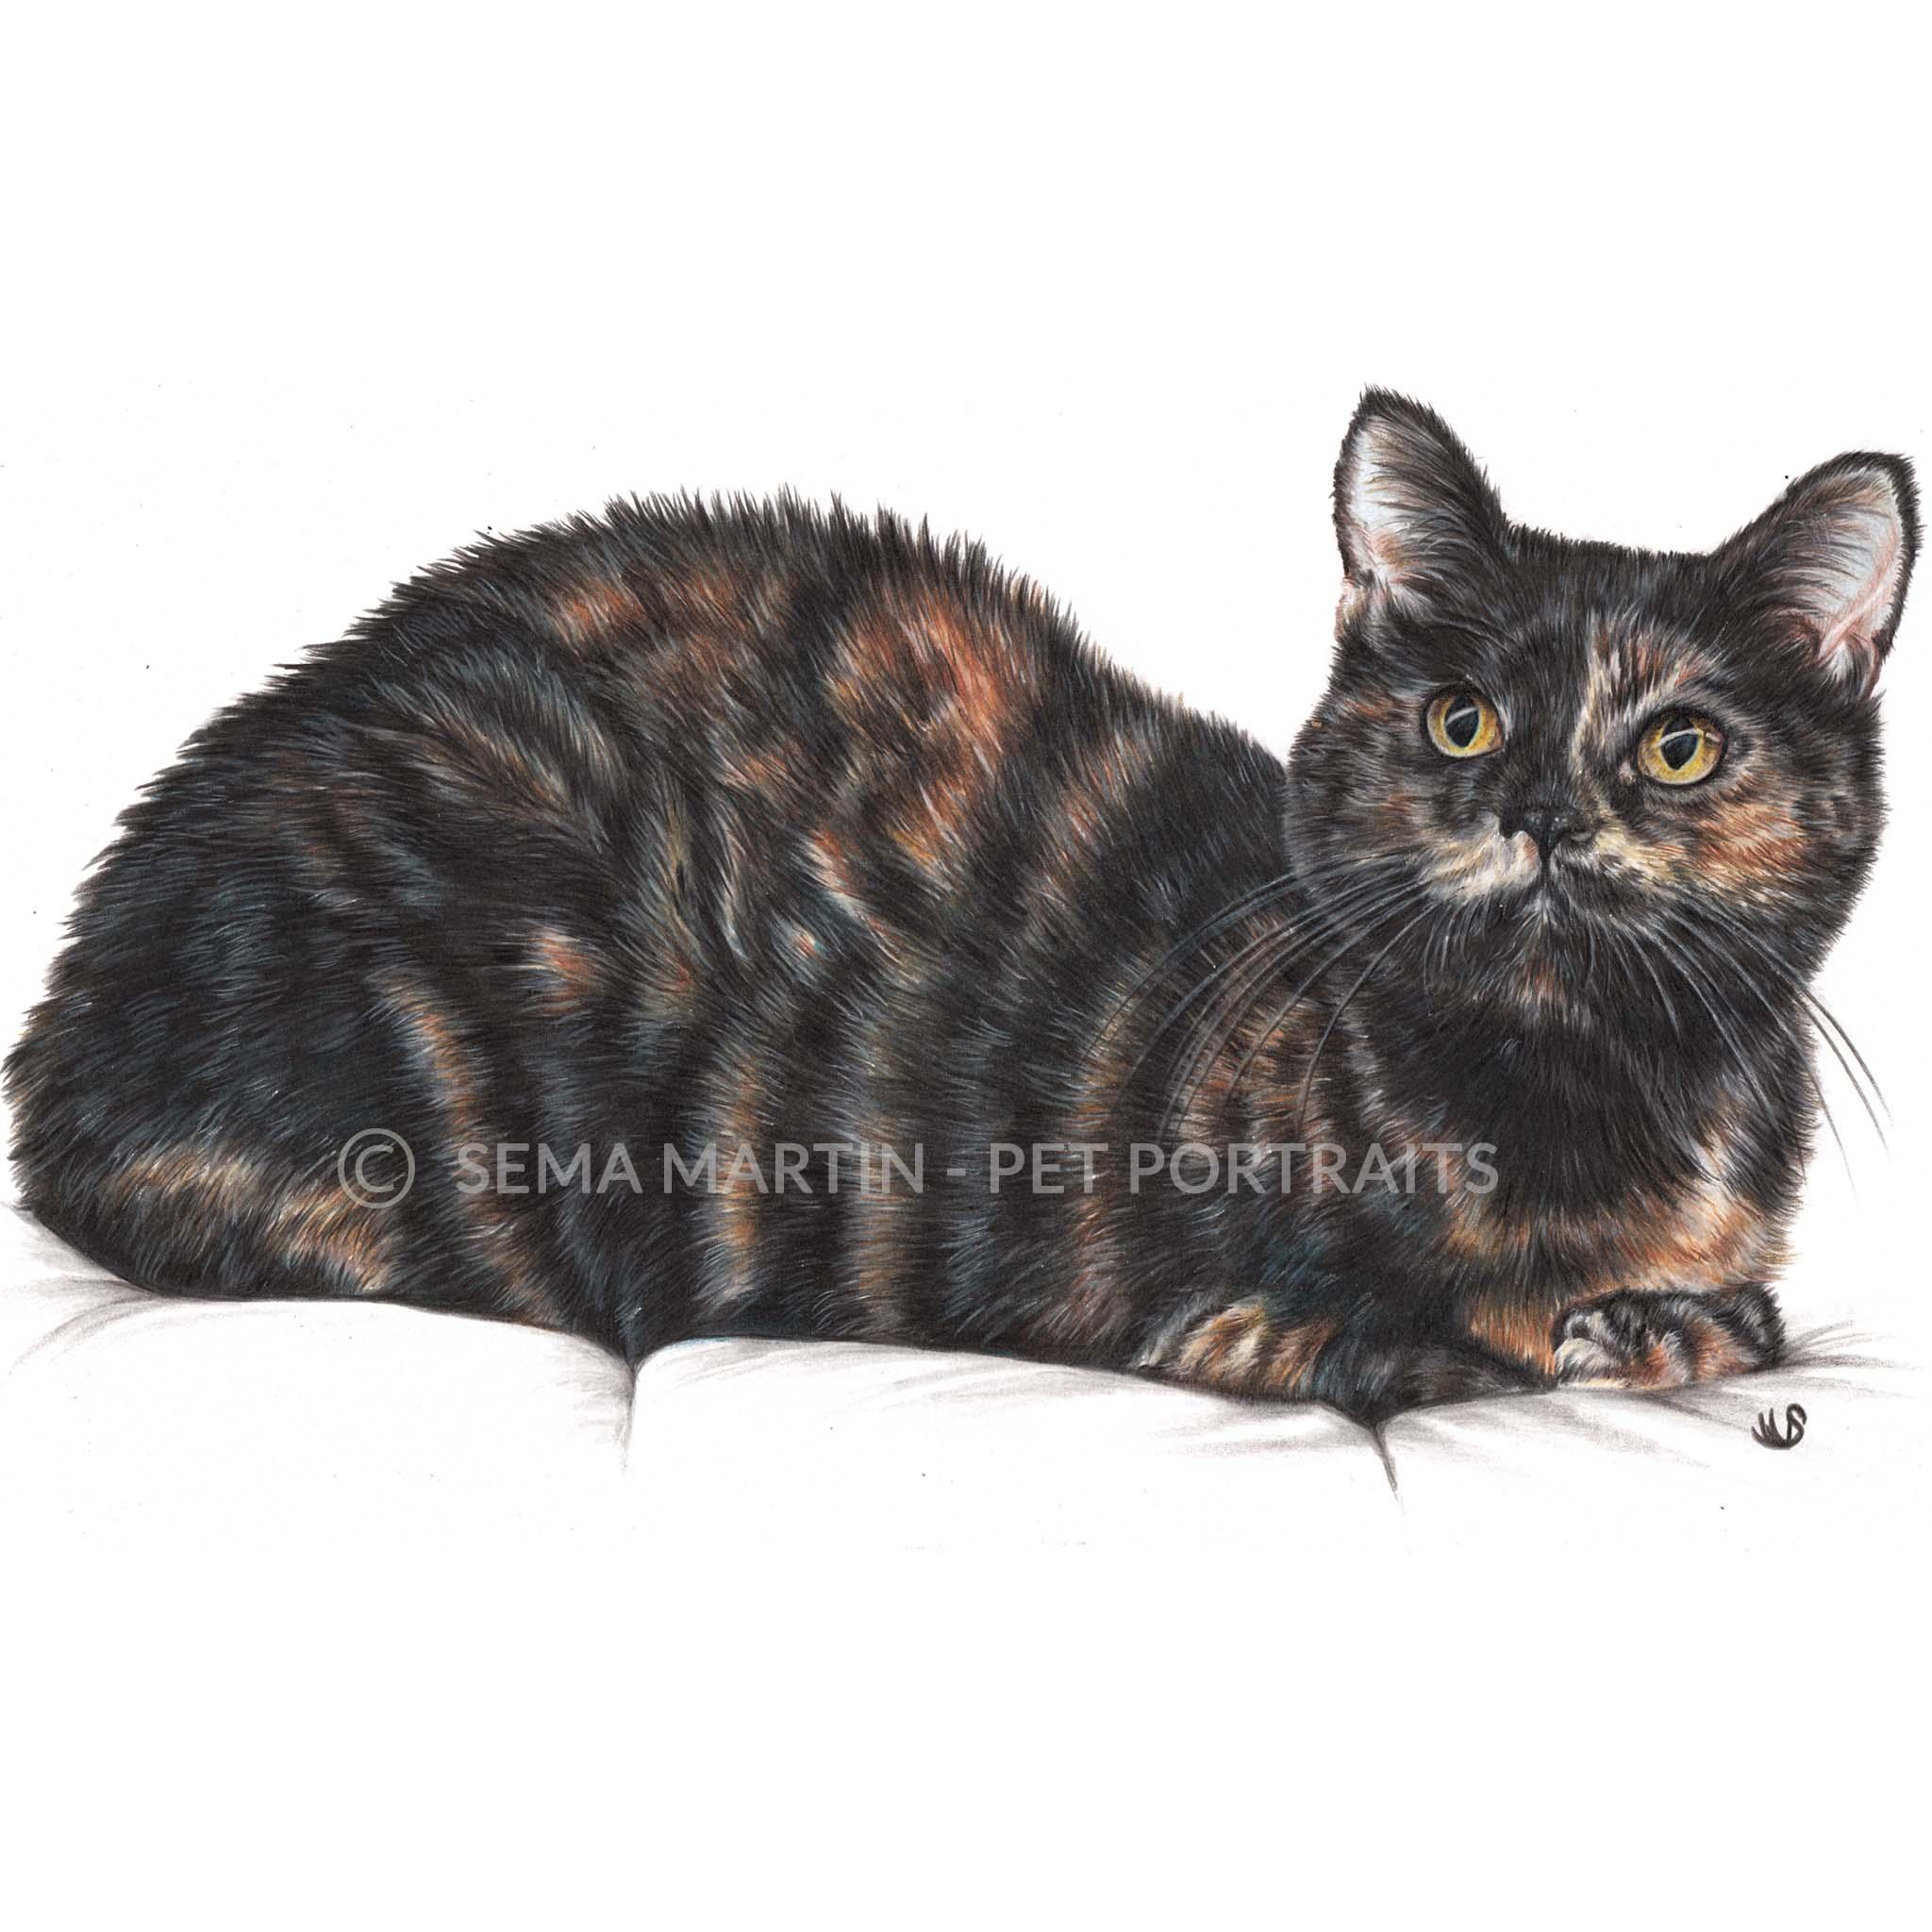 'Mitzi' - USA, 8.3 x 11.7 inches, 2019, Custom Color Pencil Tortie Cat Portrait